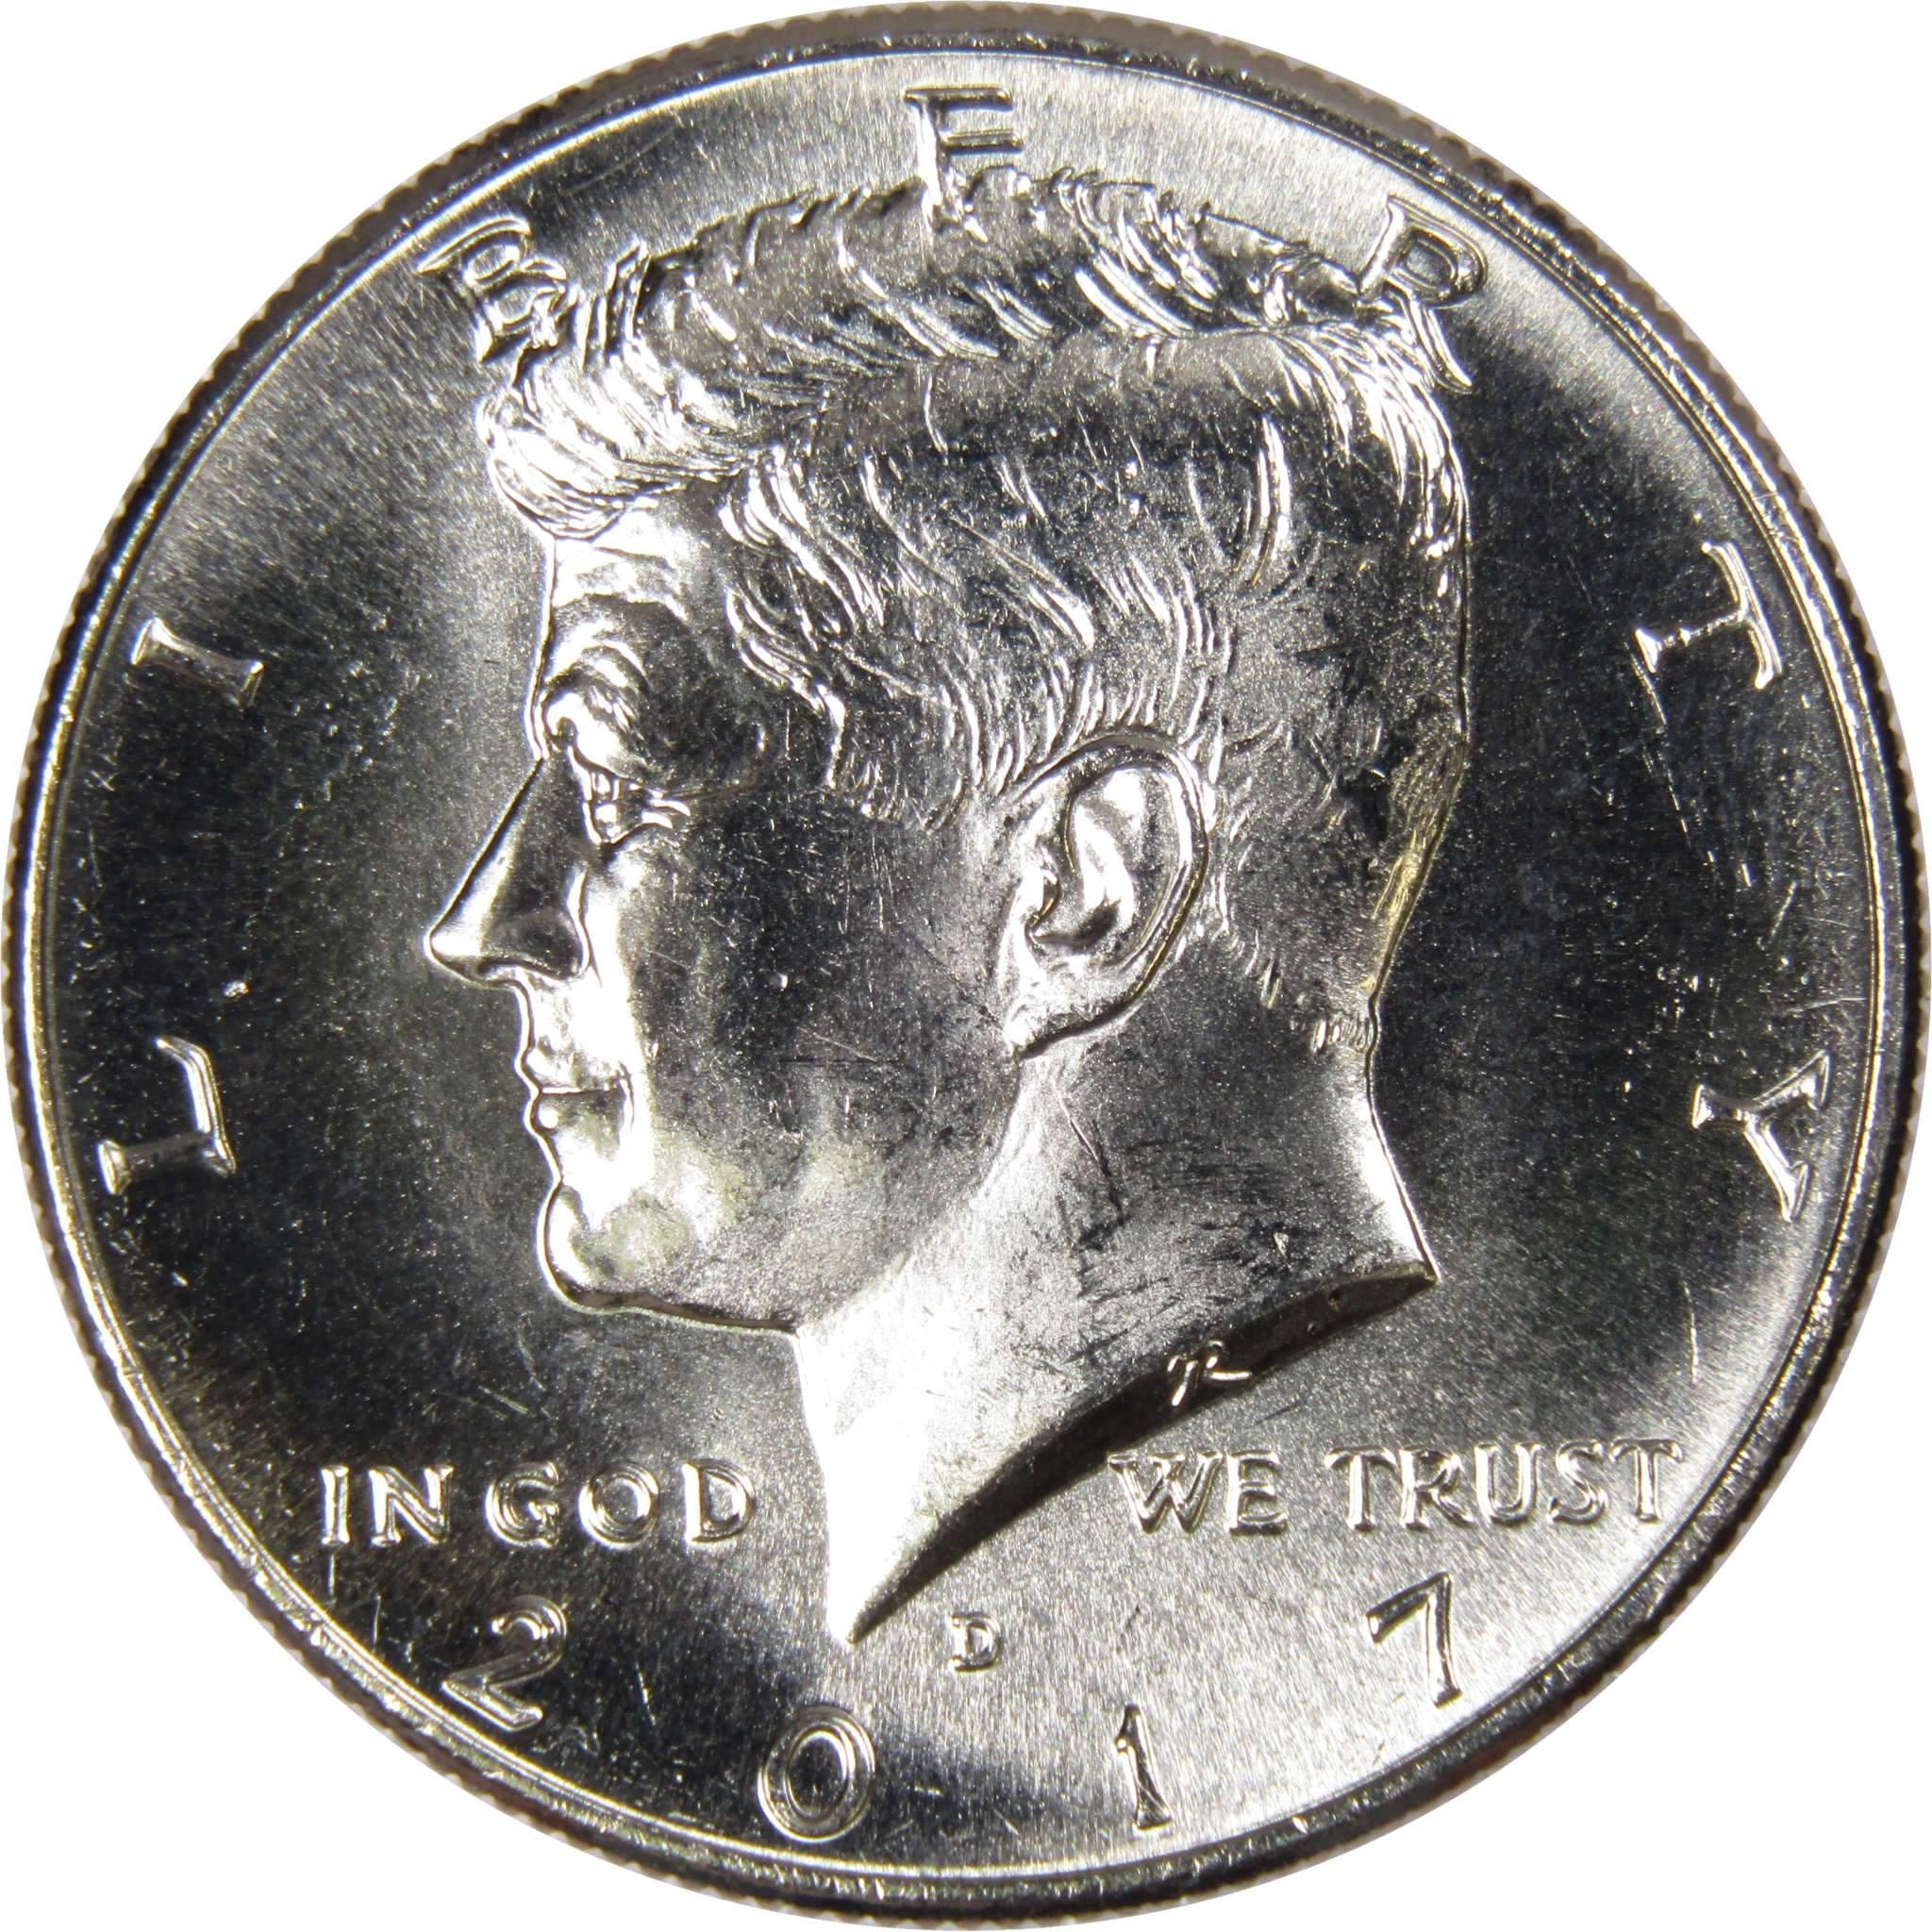 2019 S Clad Proof Kennedy Half Dollar Choice Uncirculated US Mint